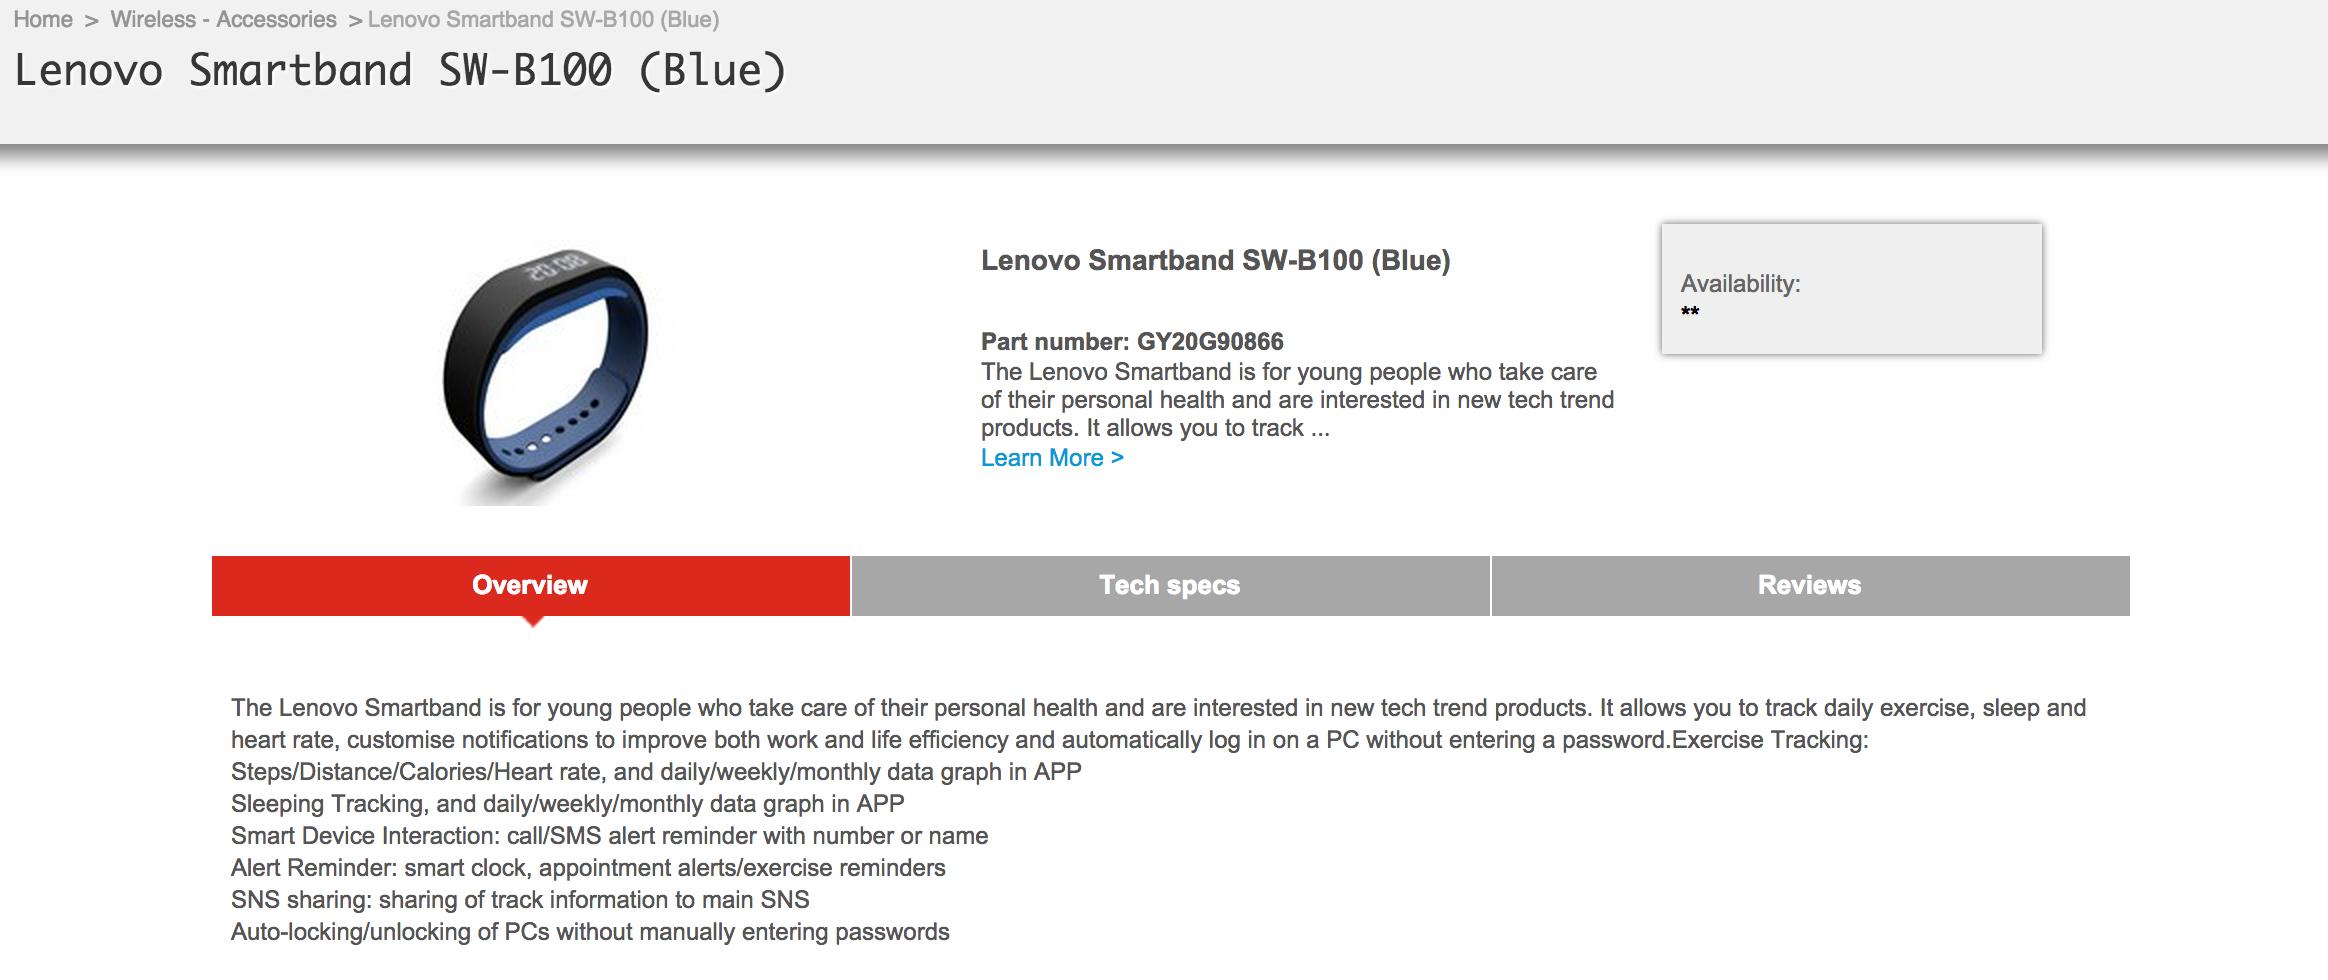 Lenovo Smartband